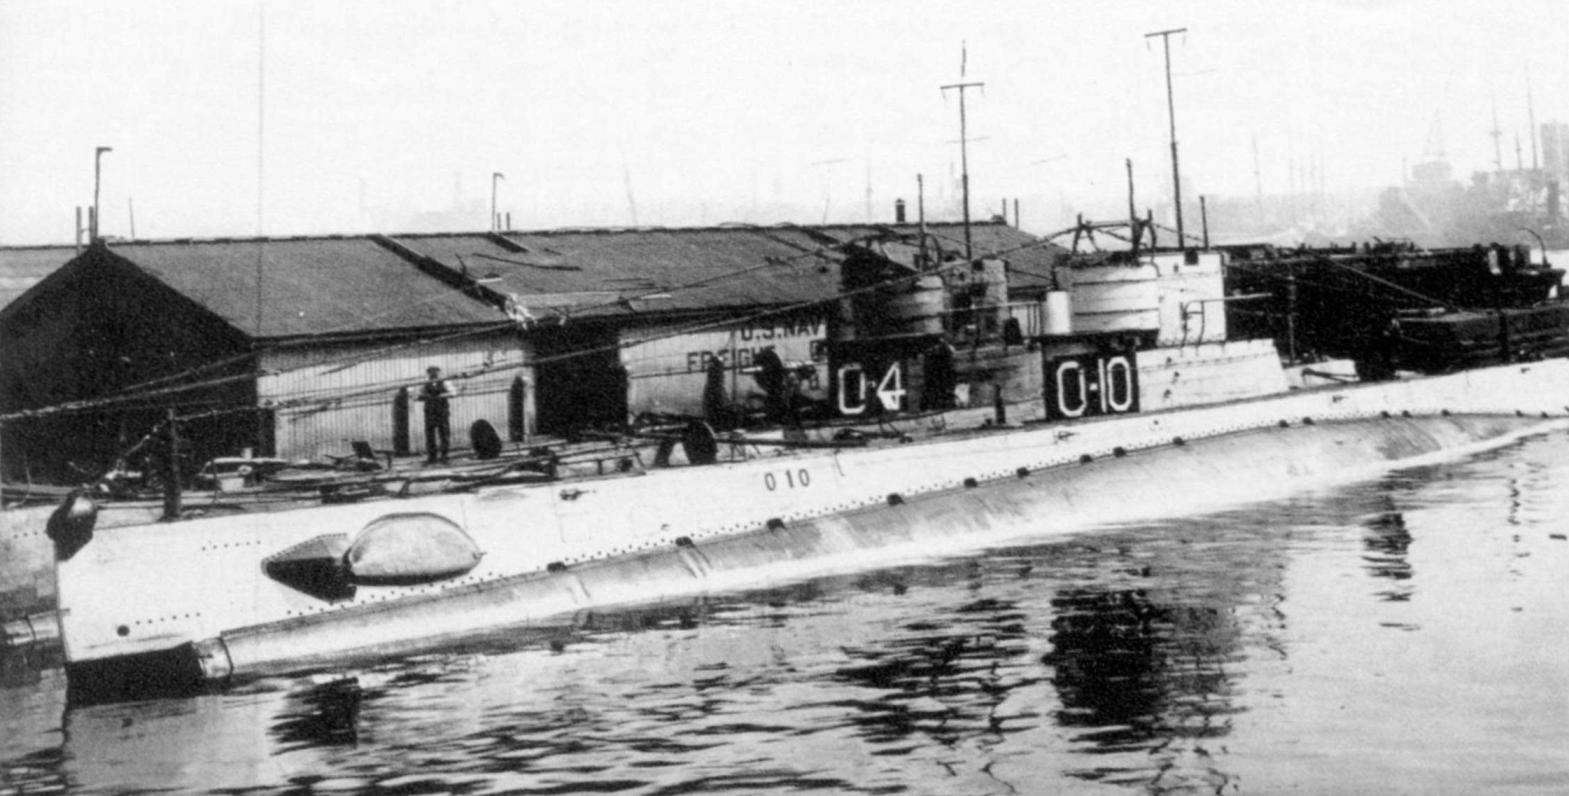 Субмарины O-10 и O-4 (на заднем плане) у причала в Бостоне